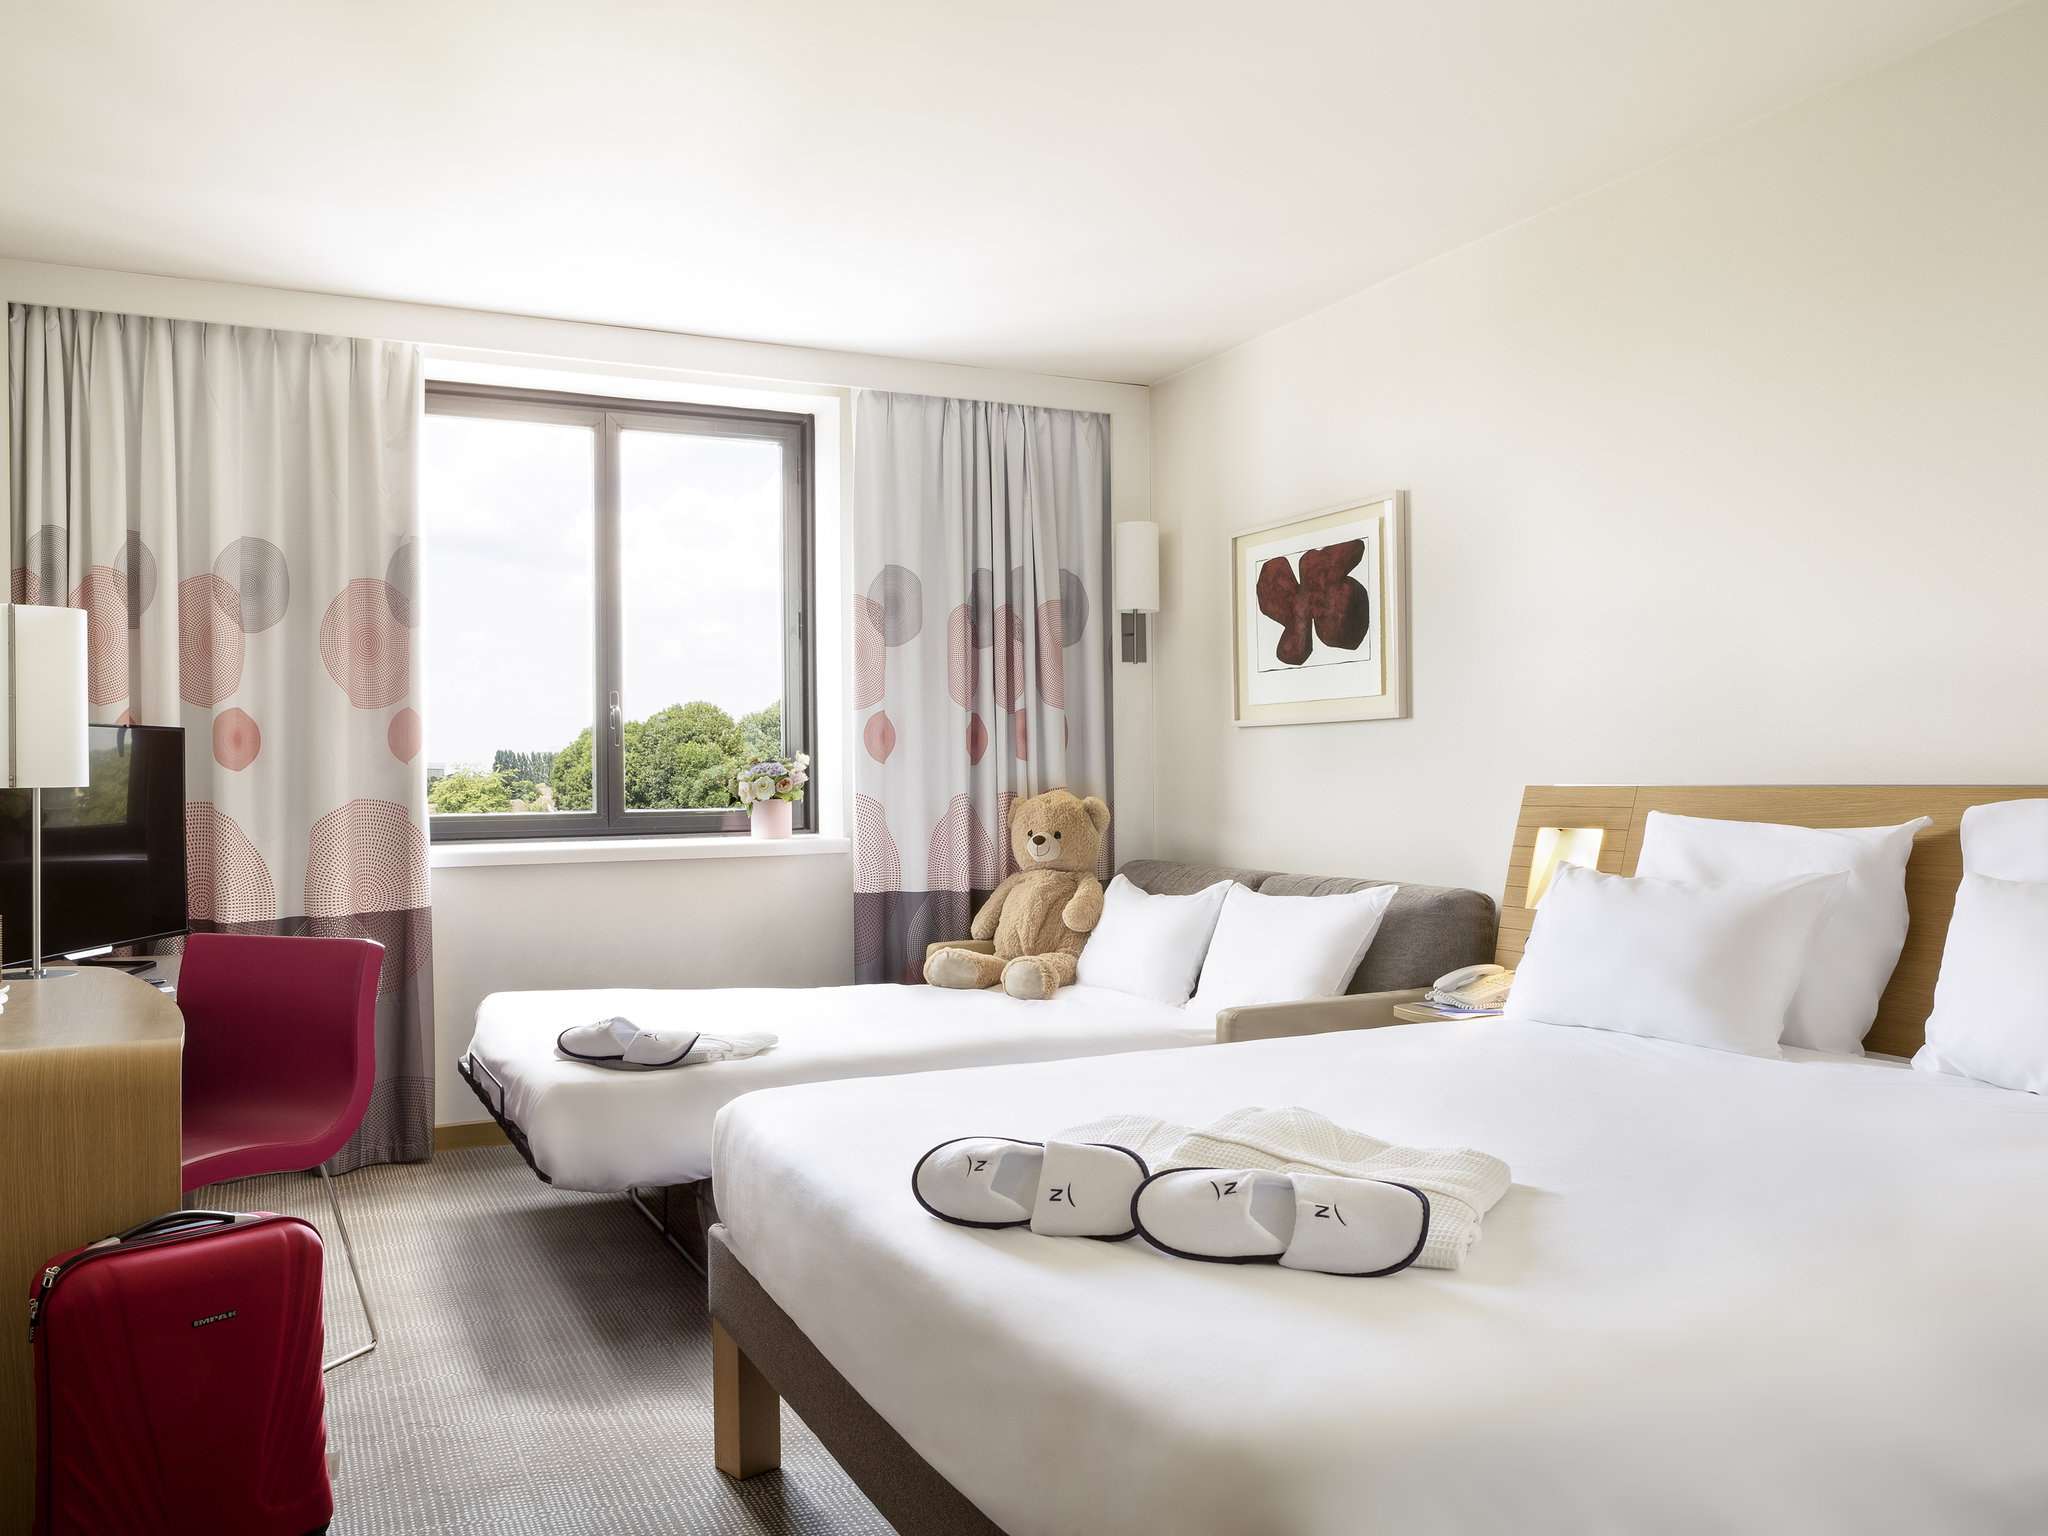 Hotel in ROISSY-EN-FRANCE - Novotel Roissy CDG Convention & Spa